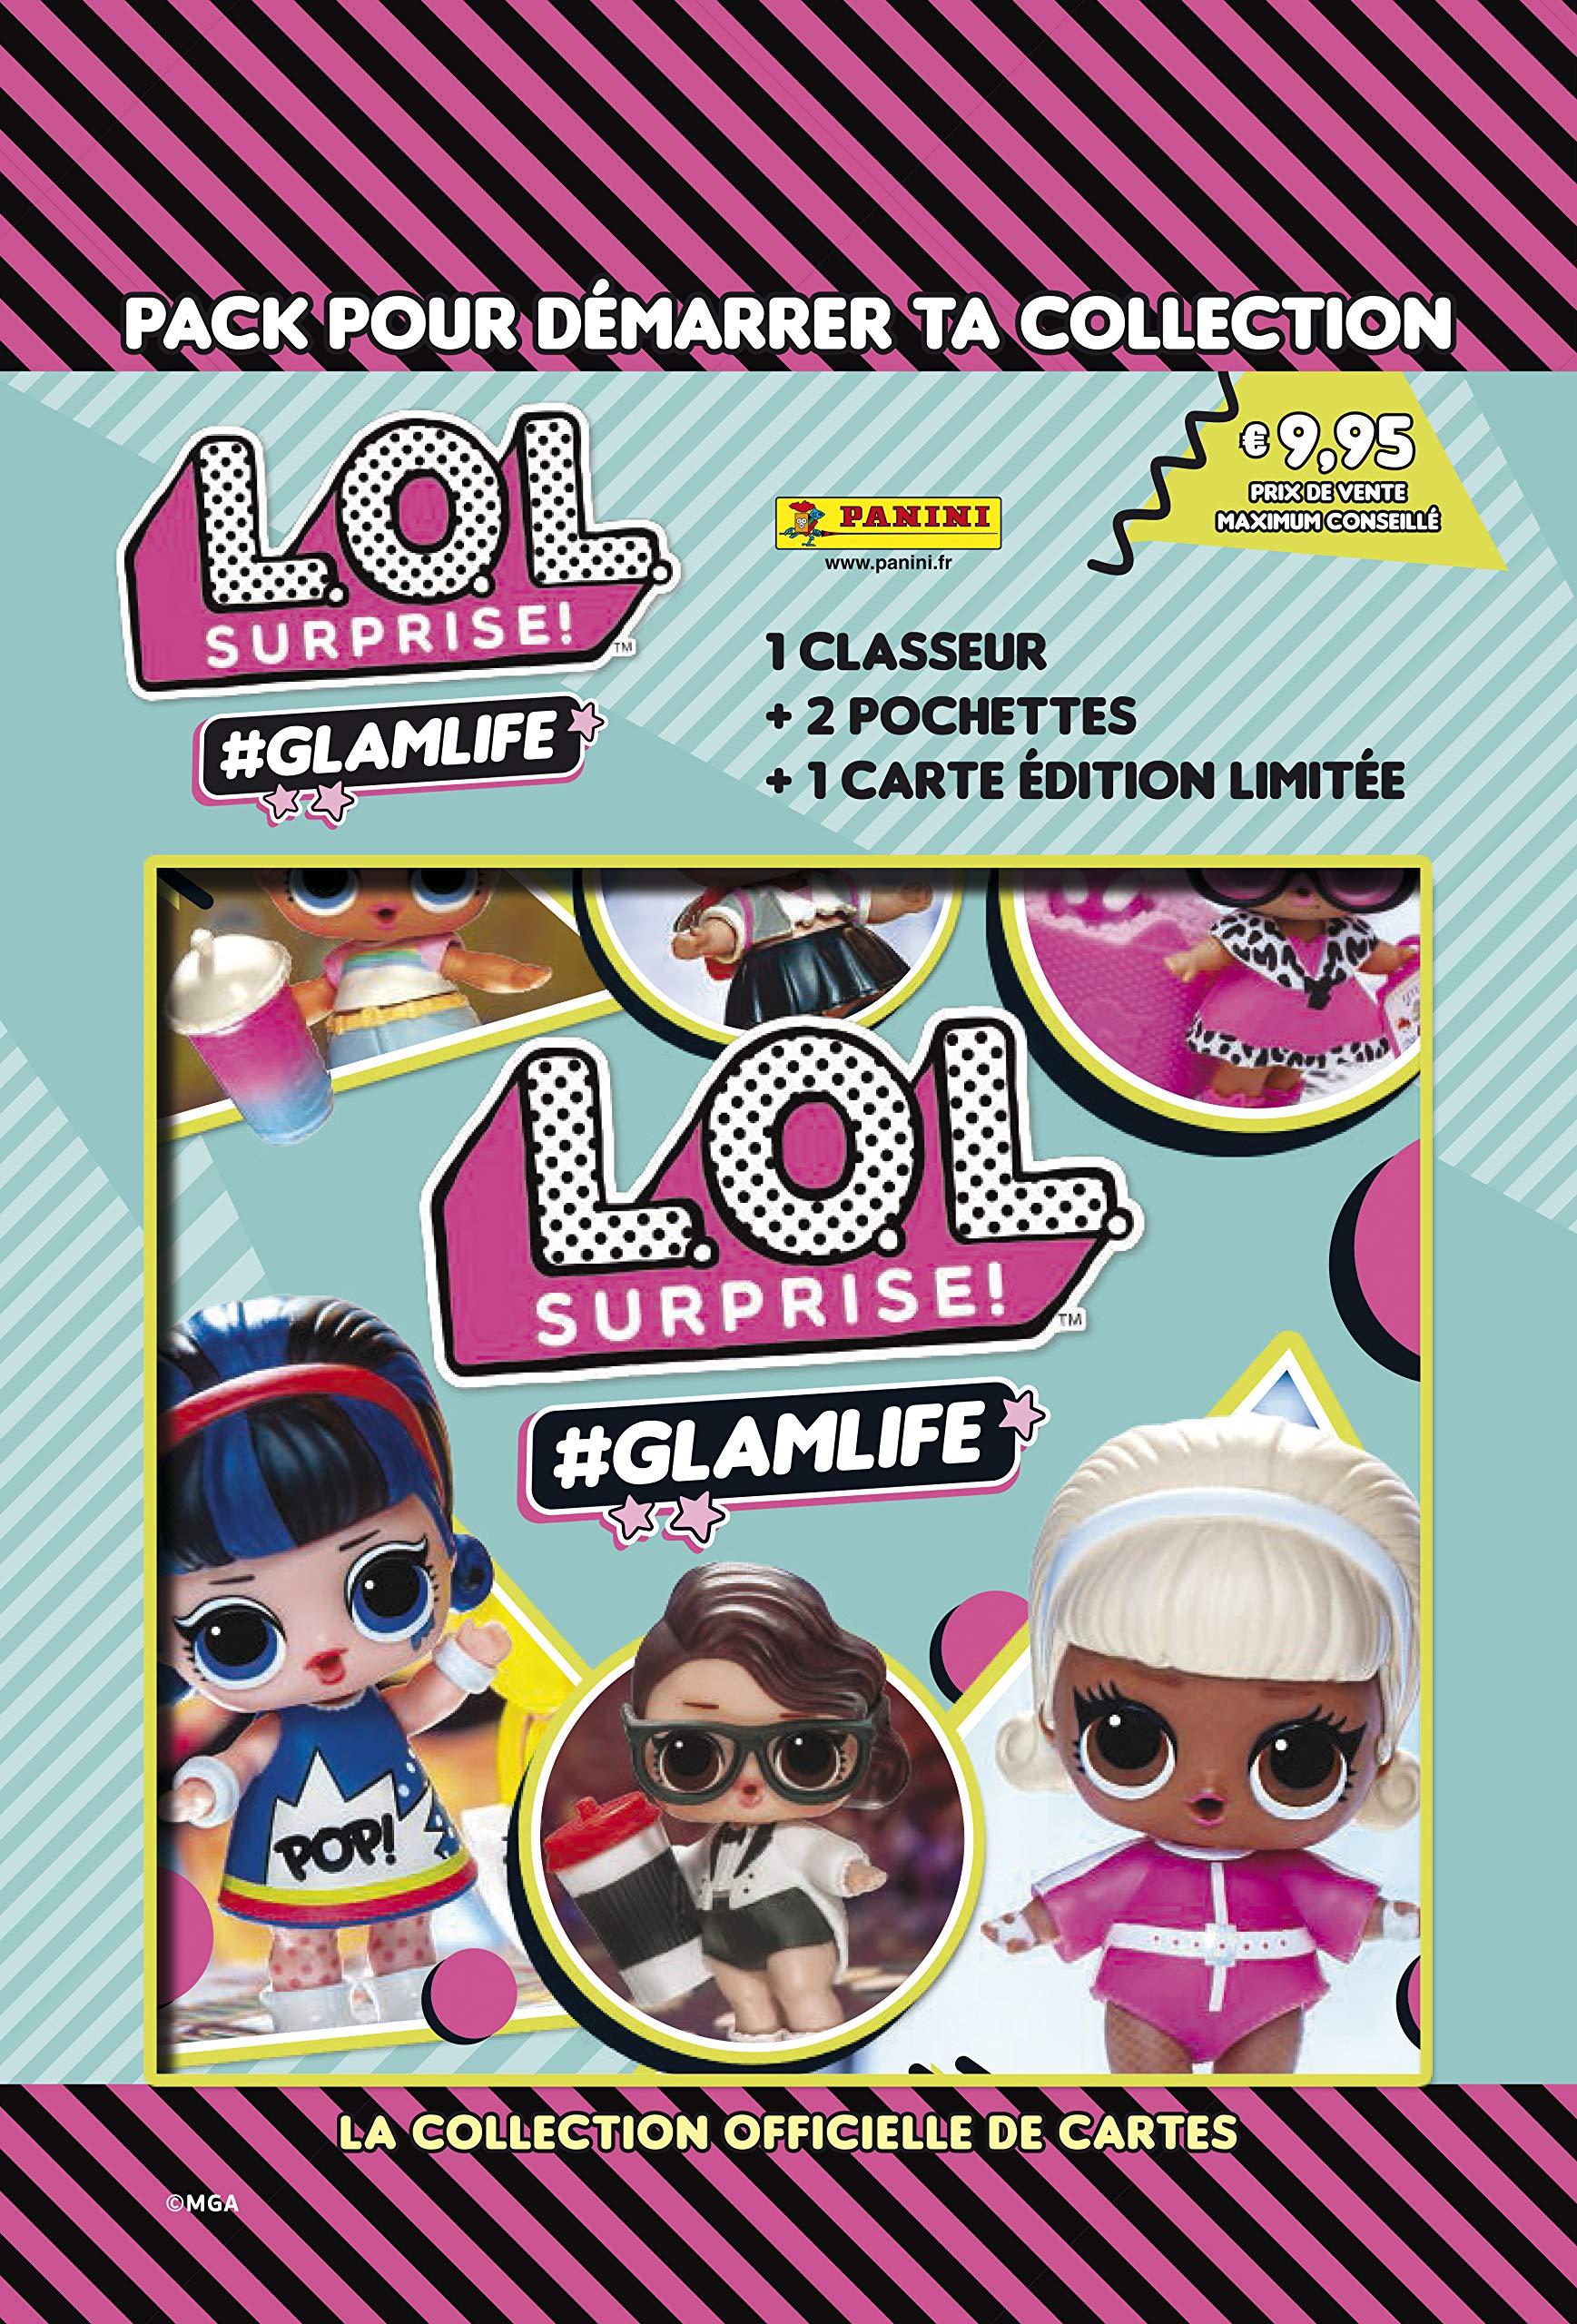 L.O.L Sorpresa! #GlamLife Trading Card Collection Starter Pack: Amazon.es: Juguetes y juegos